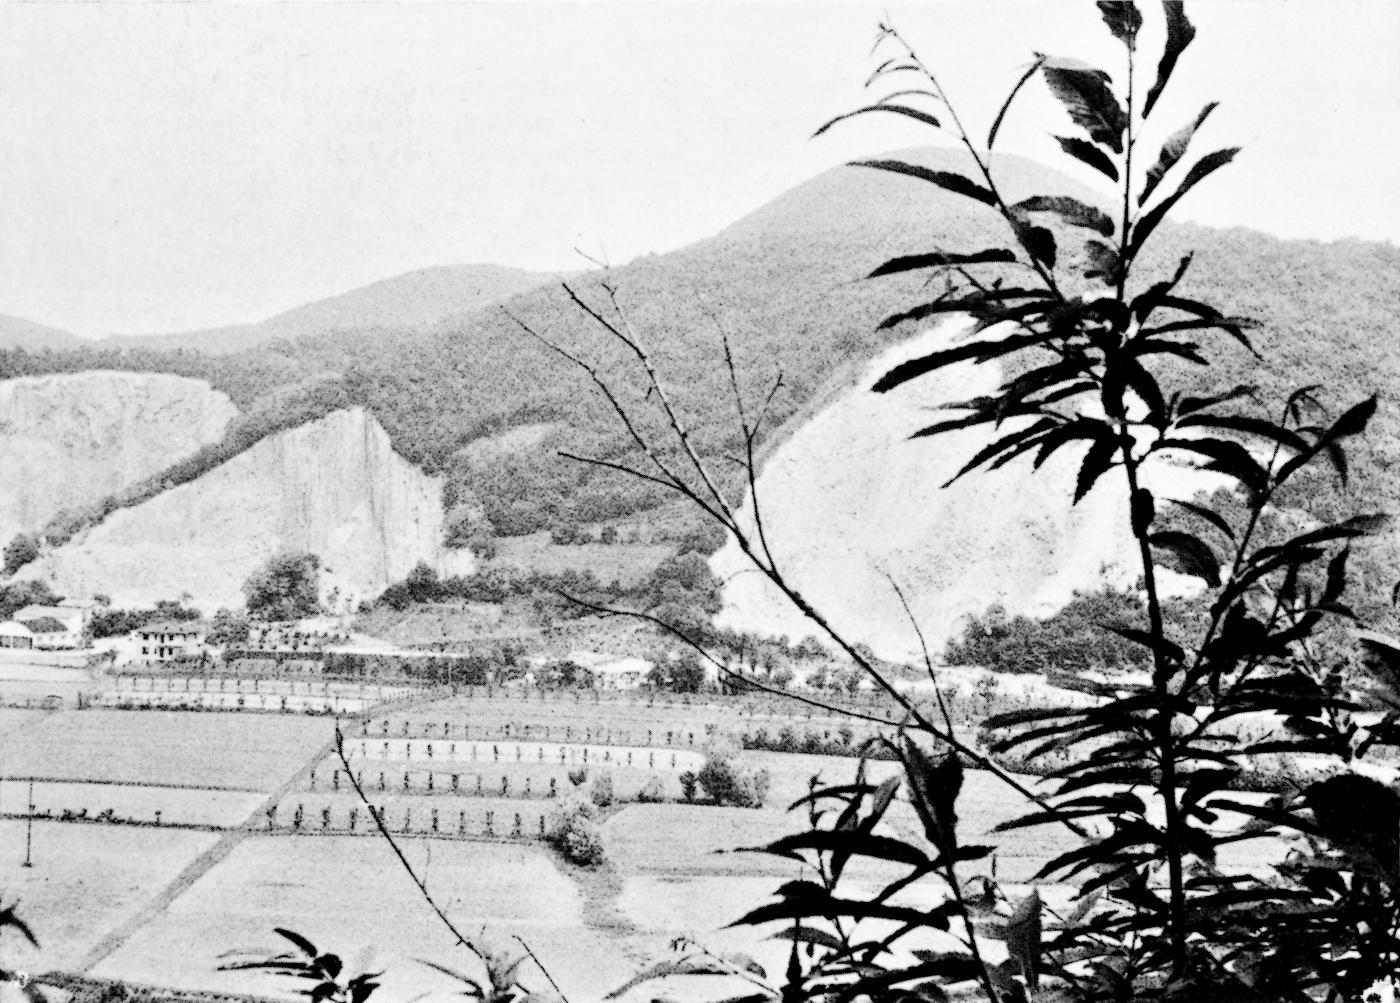 Cave sul monte Lonzina (Torreglia).